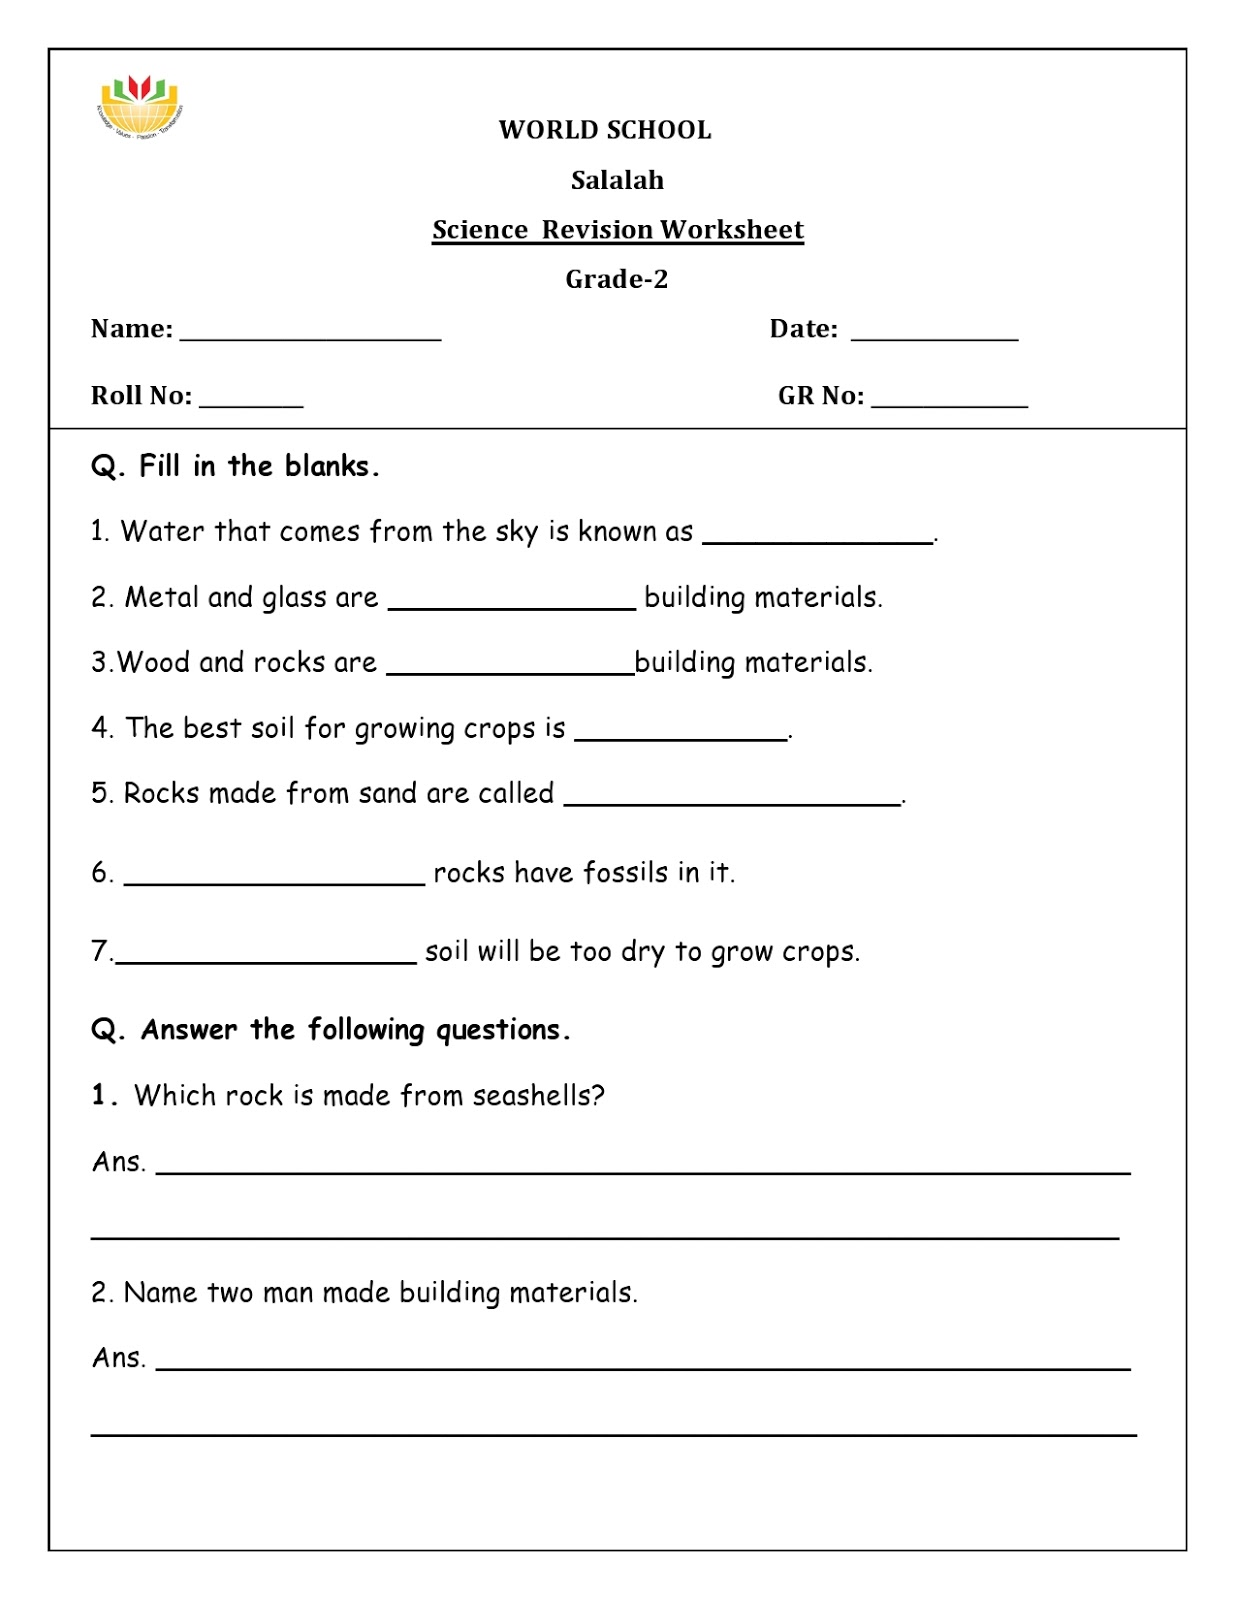 Birla World School Oman Homework For Grade 2 As On 12 04